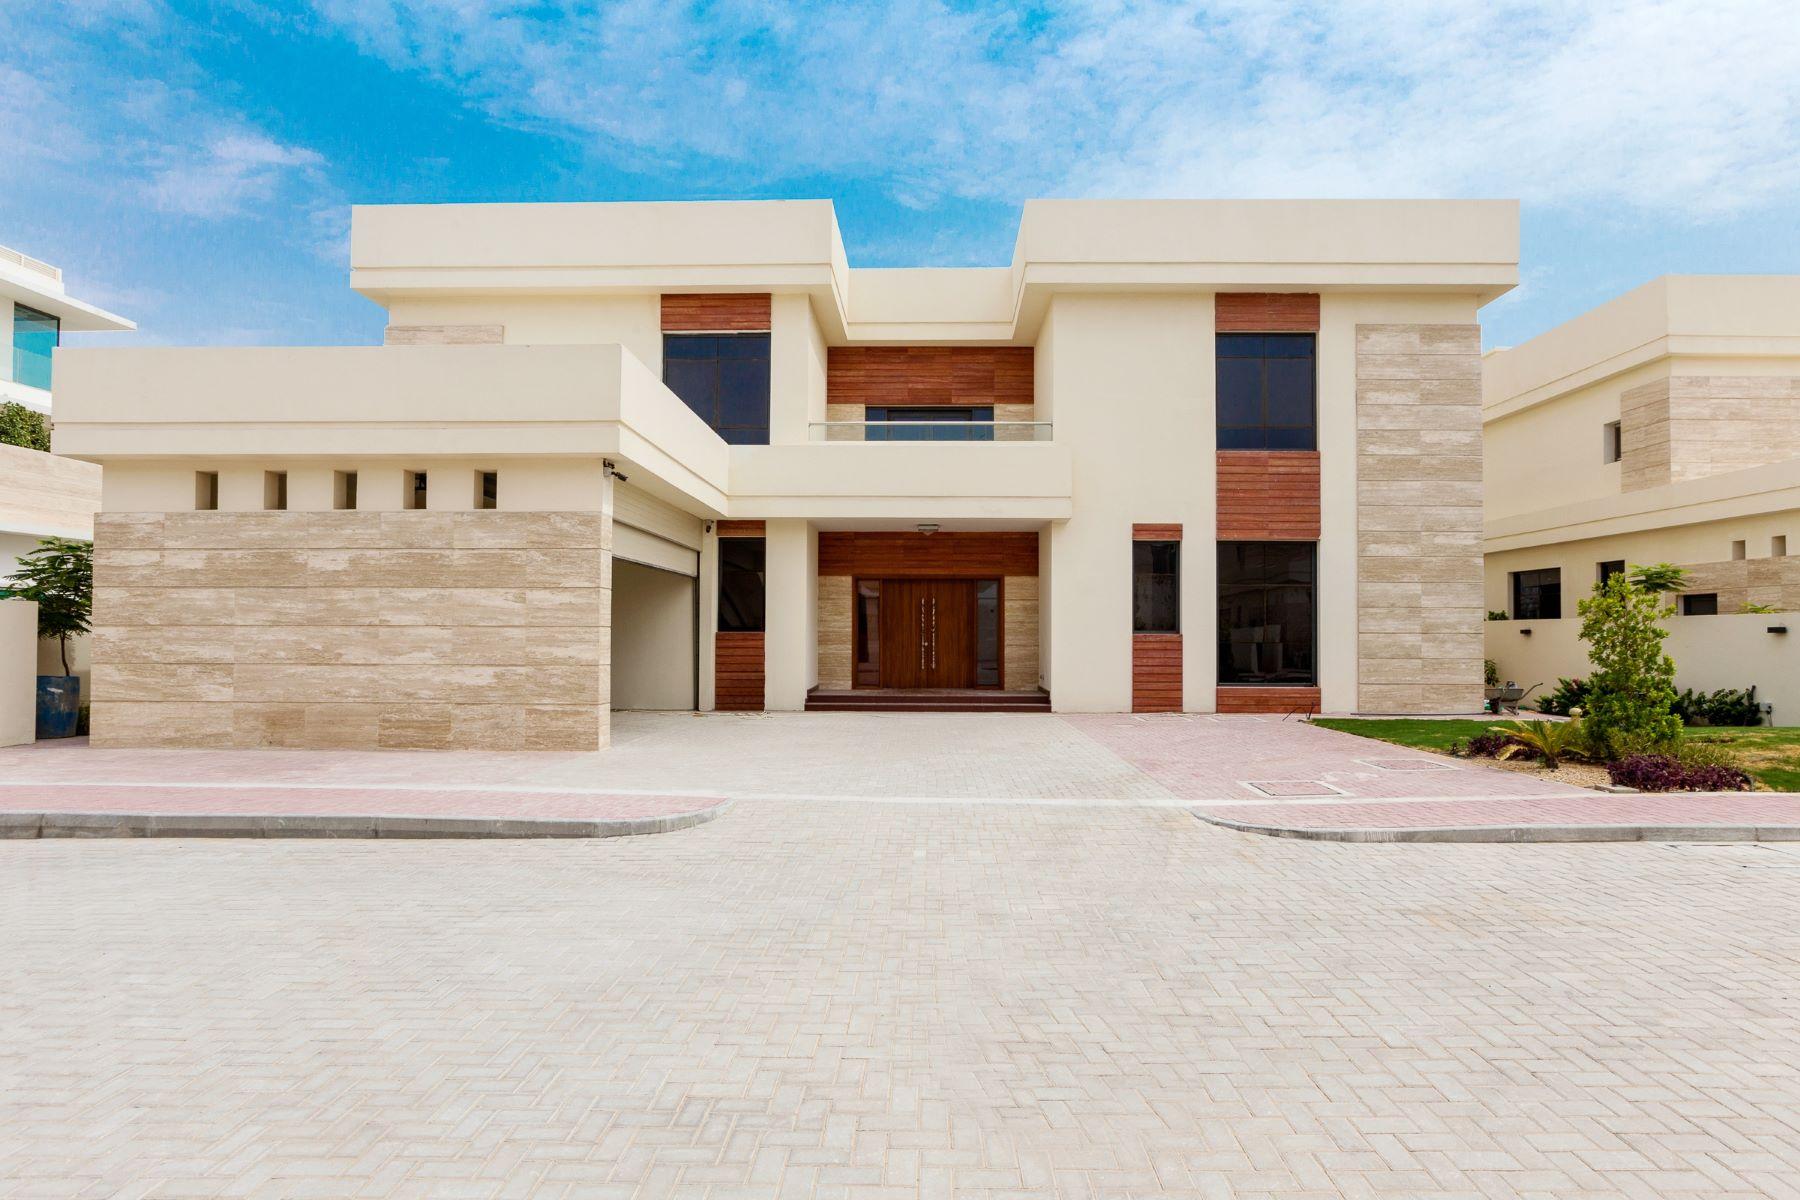 Additional photo for property listing at VIP Frond  4 Luxury Villas Tip Location Dubai, Dubai Birleşik Arap Emirlikleri